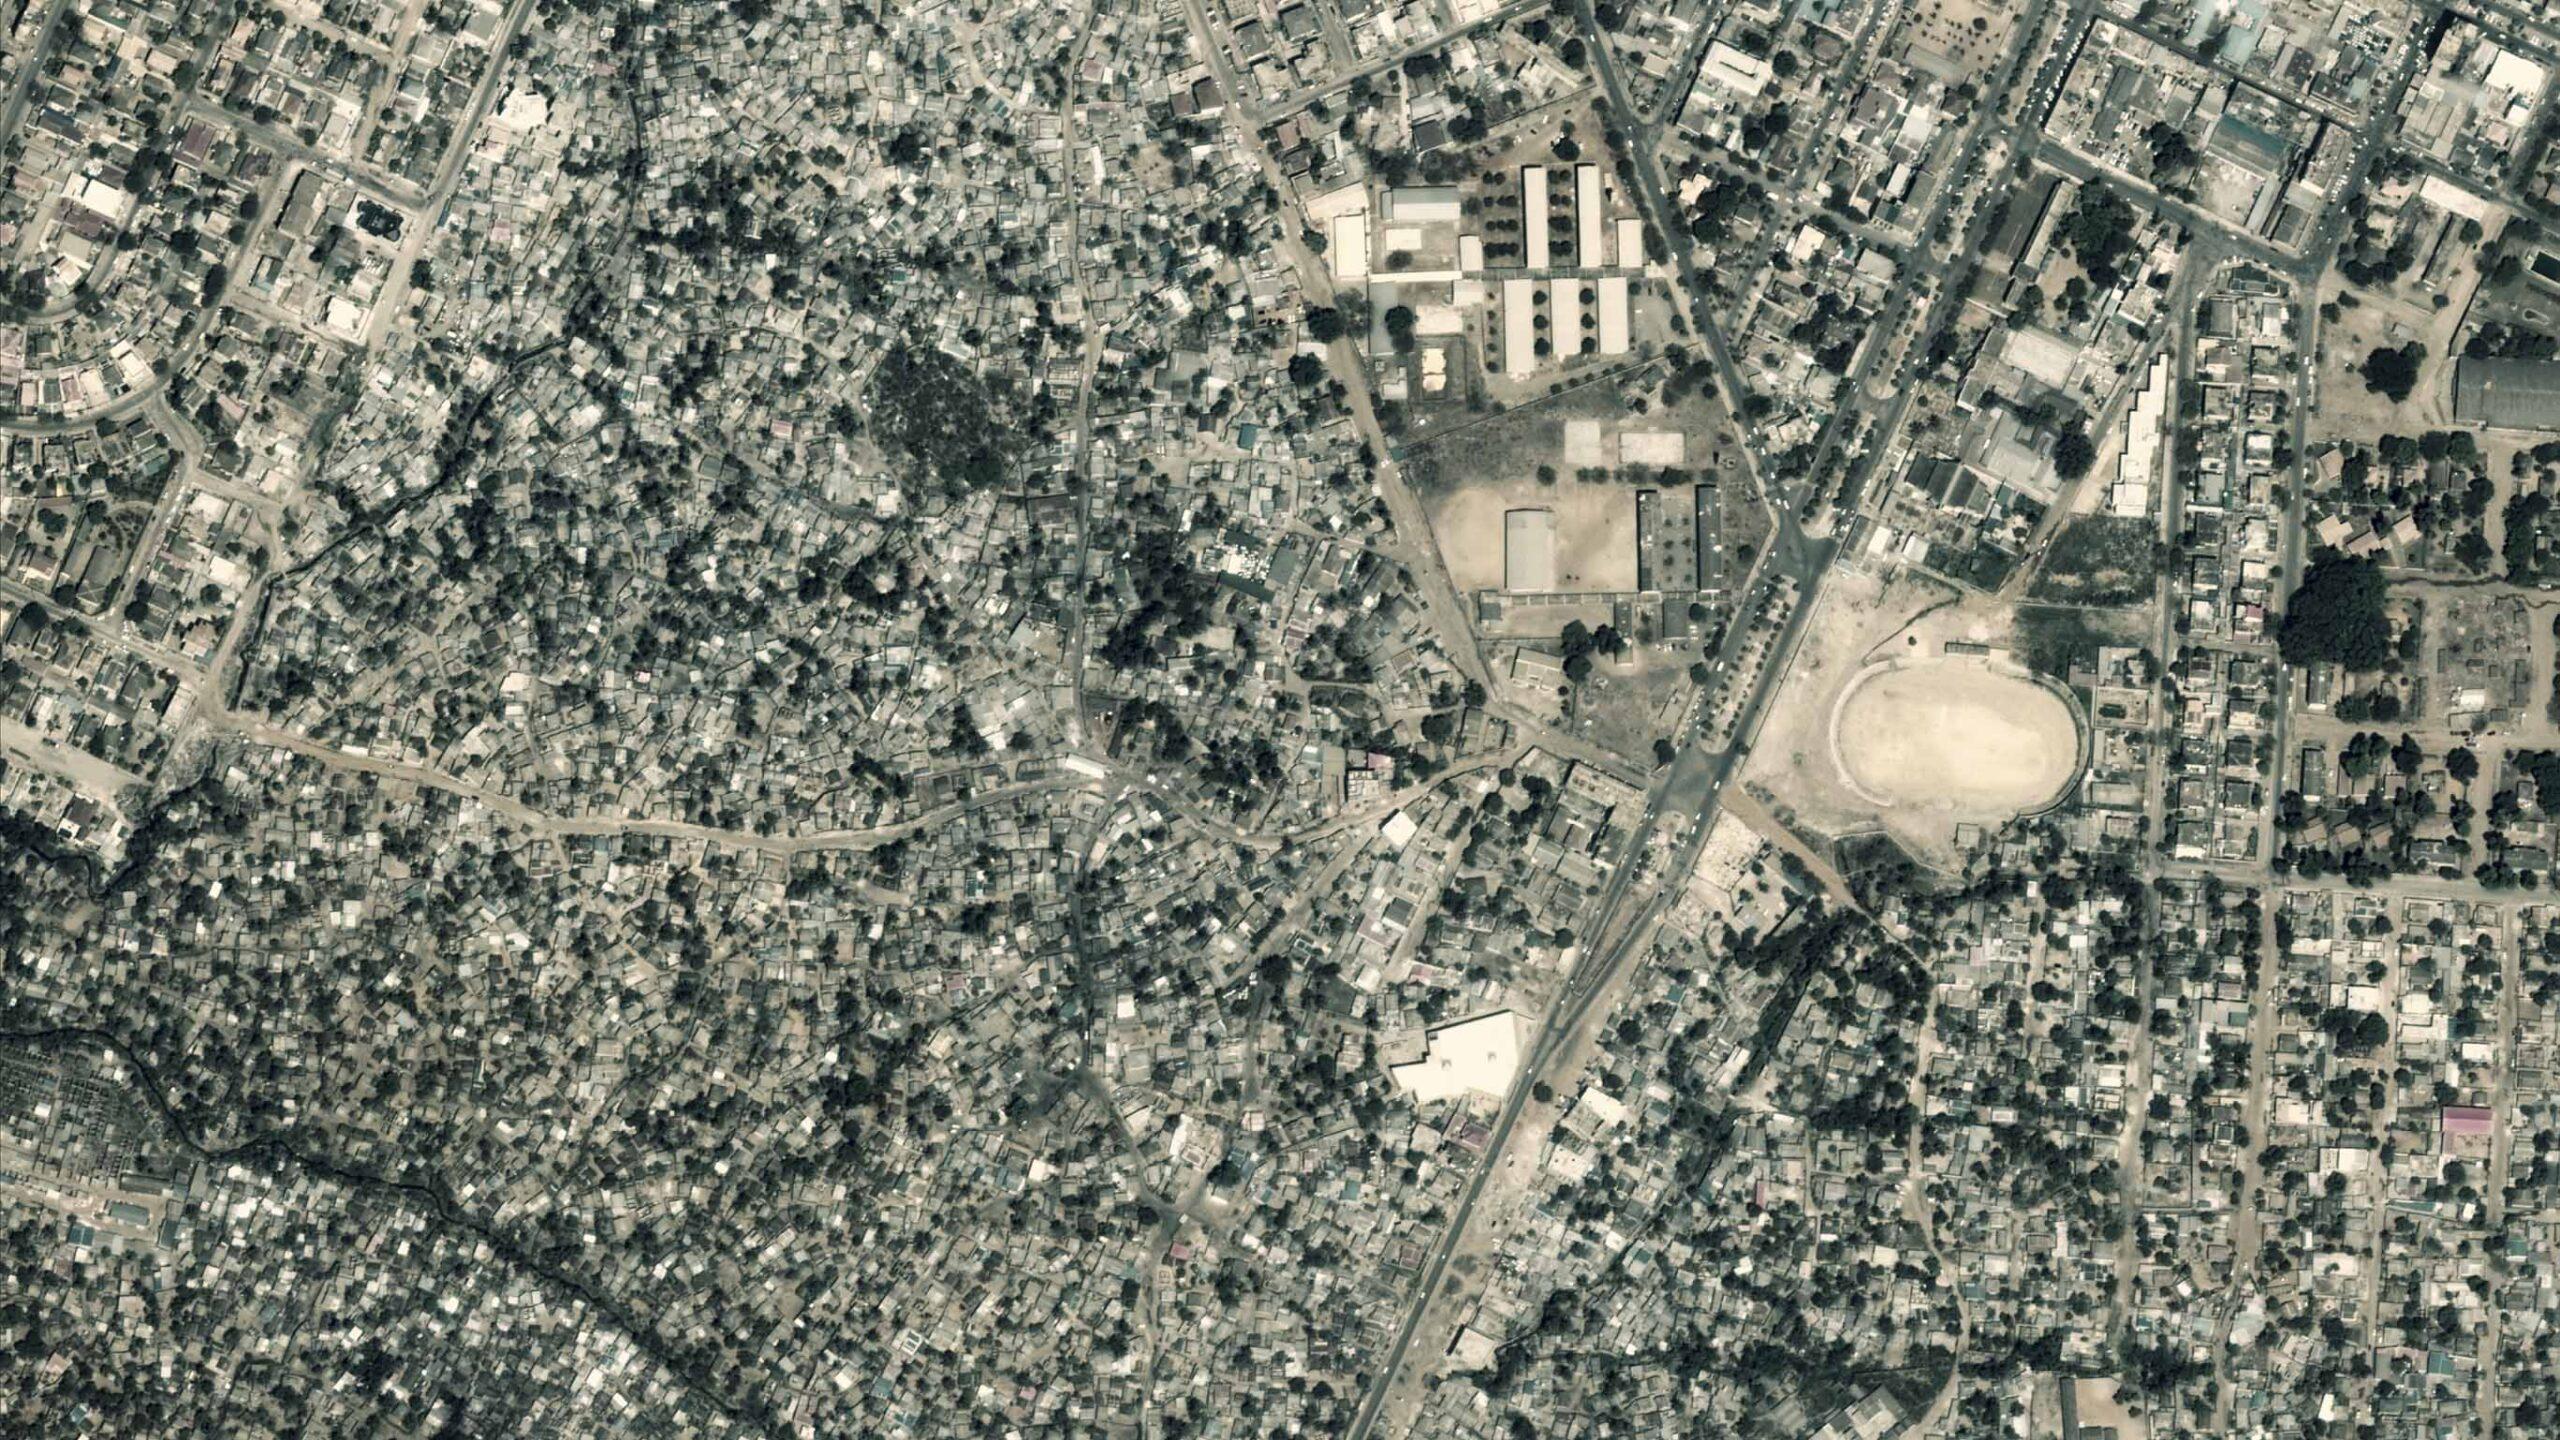 Achieving Sustainable Urban Development ASUD Mozambique: Nacala, Nampula and Tete Corridor